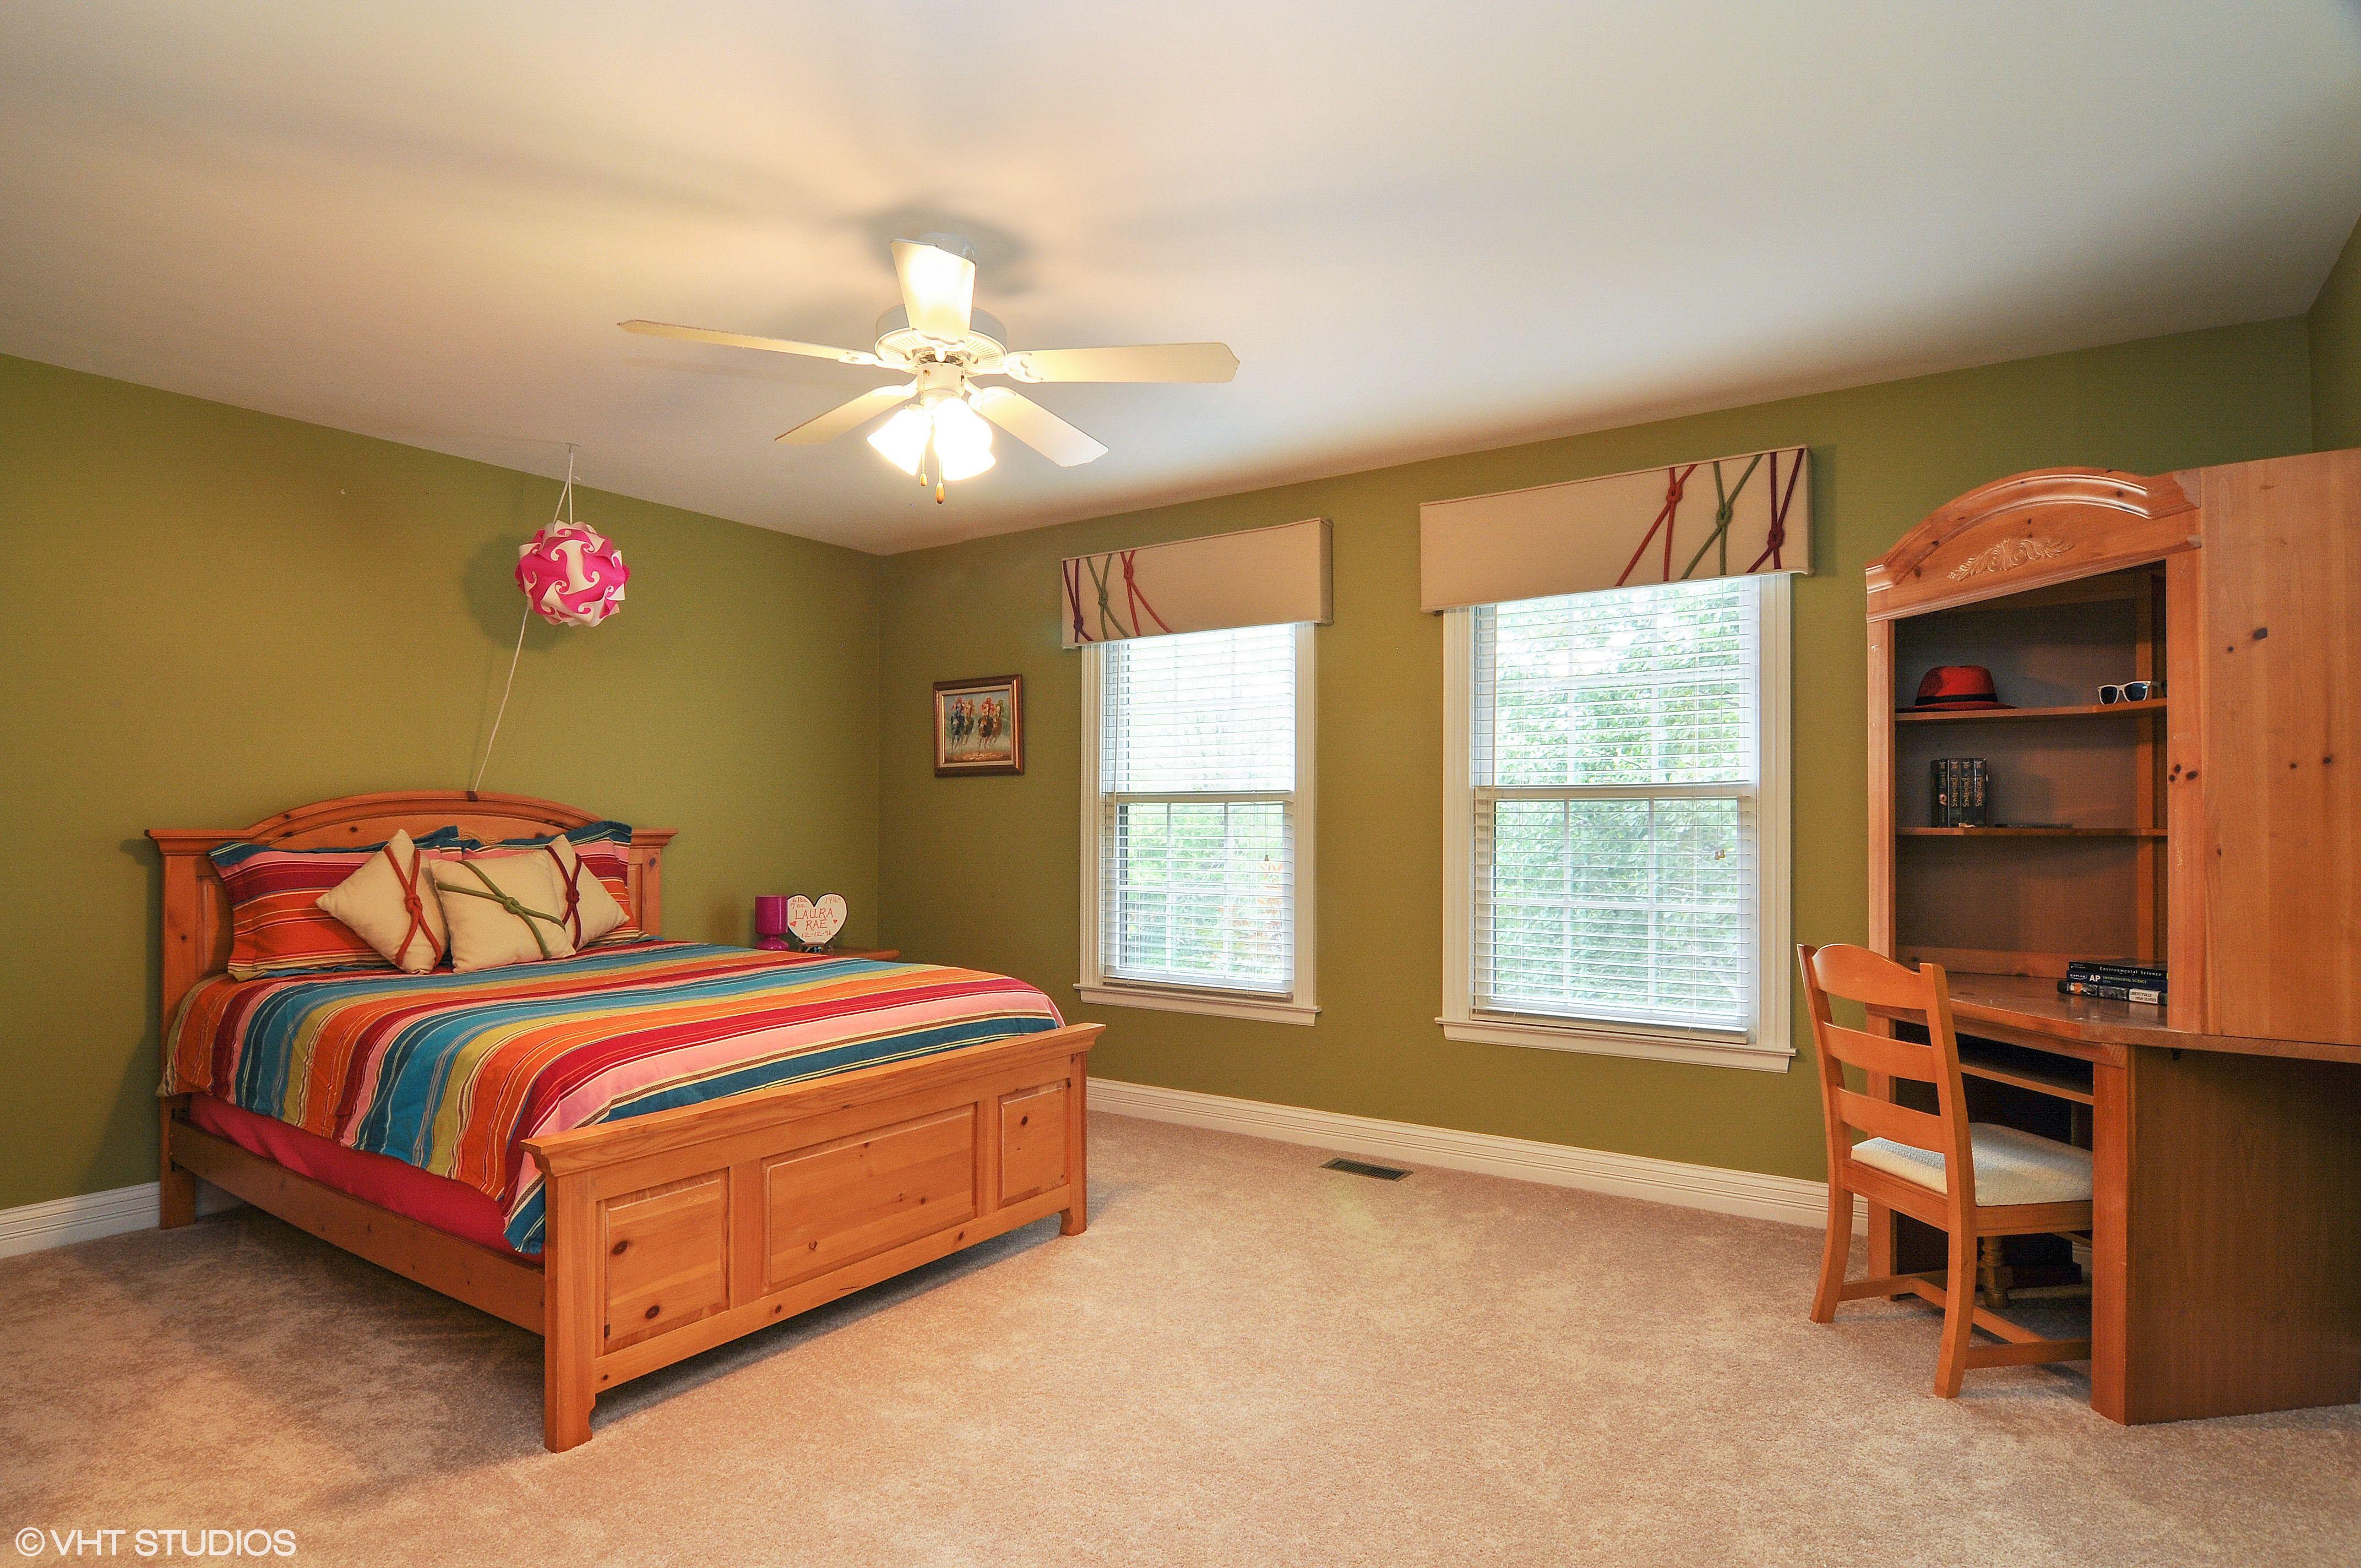 Bedroom 4 childsroom bedroom 1237ashbury libertyville